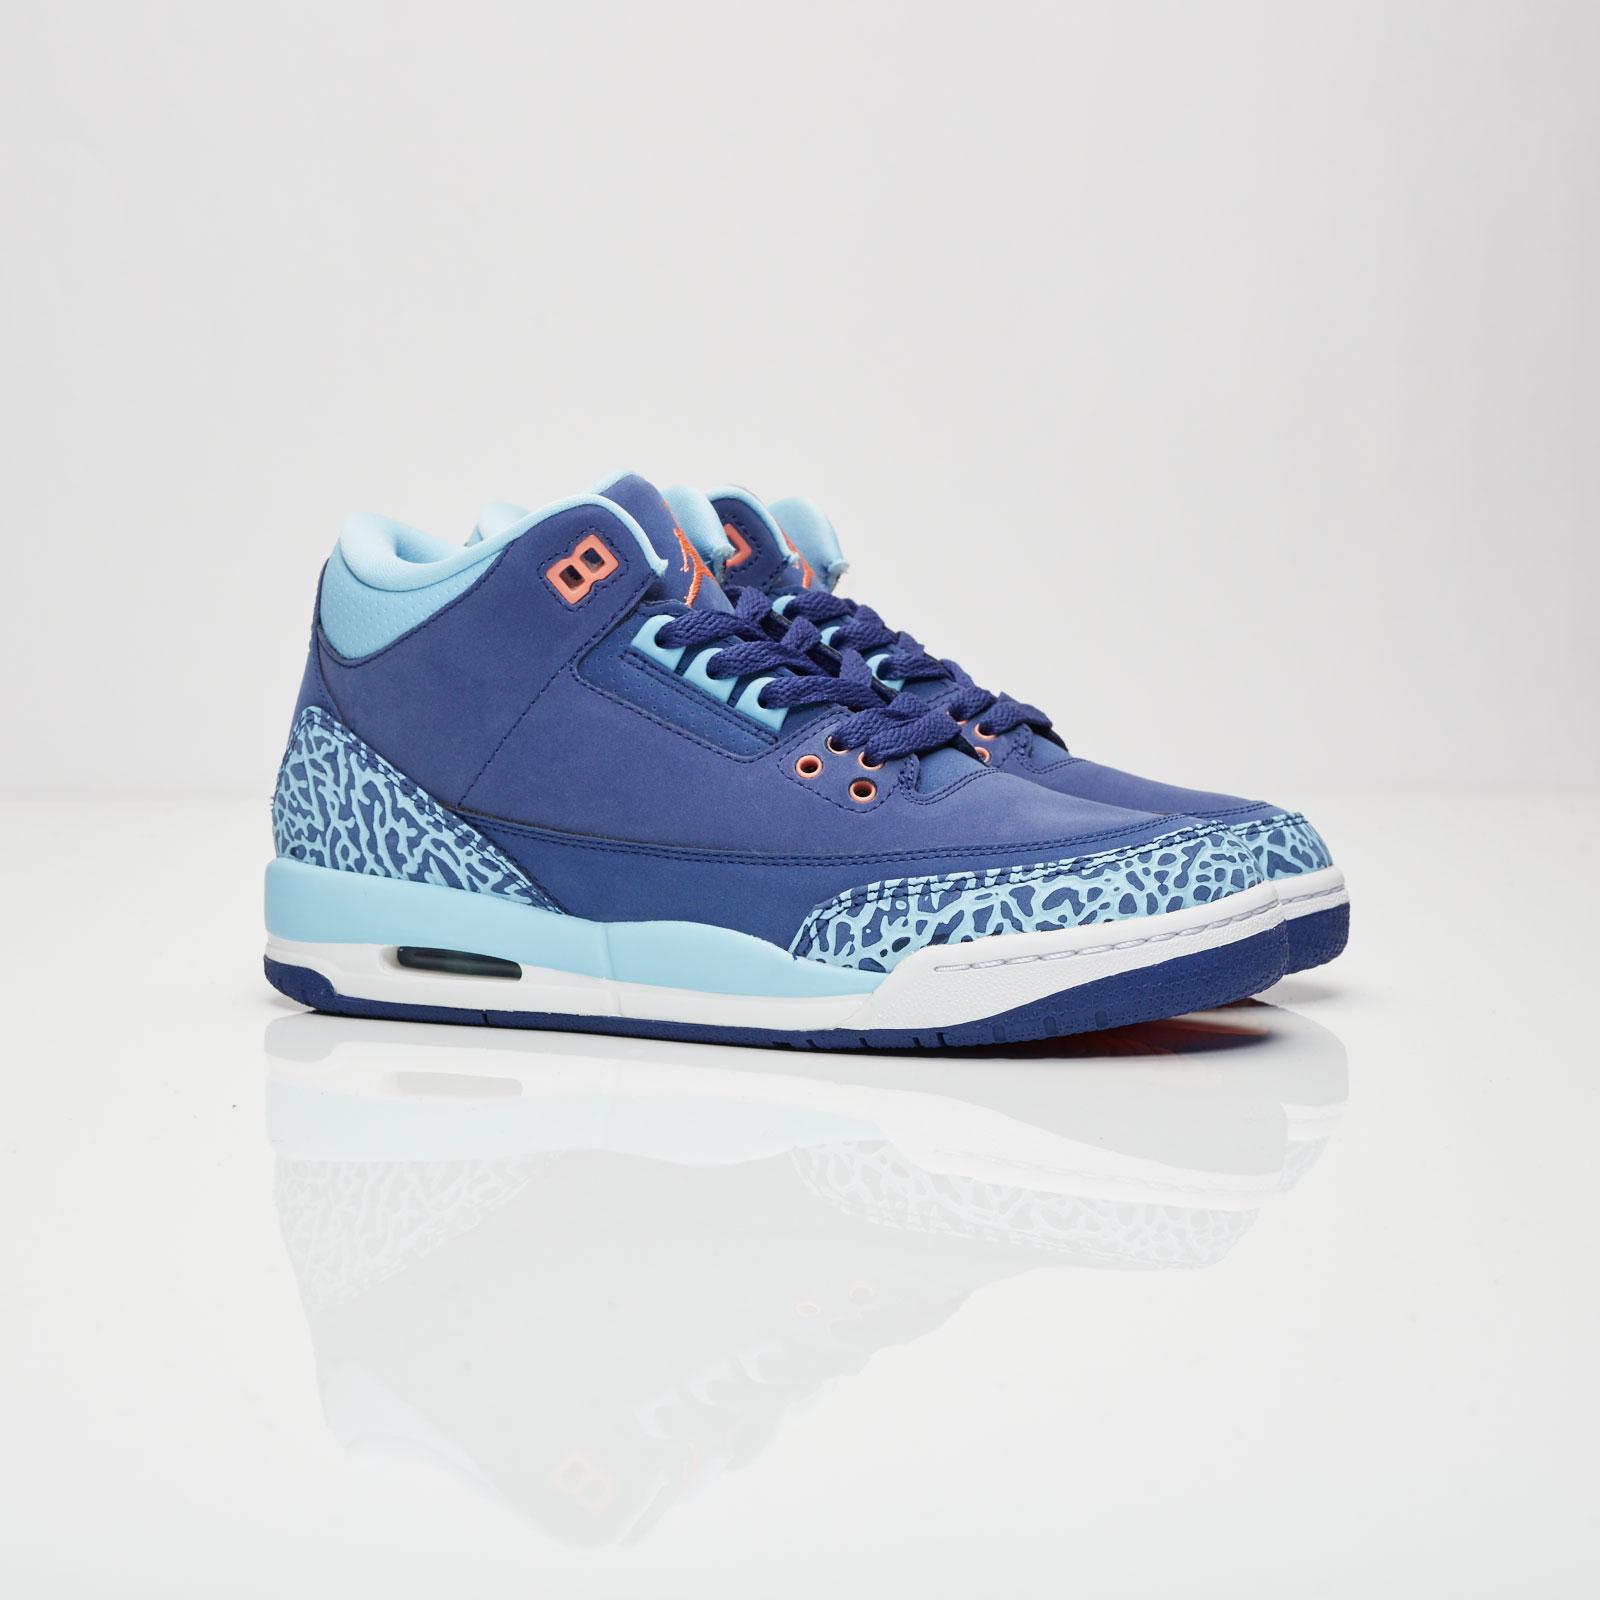 Jordan Brand Air Jordan 3 Retro (GS) - 441140-506 - Sneakersnstuff ... 127a628bc